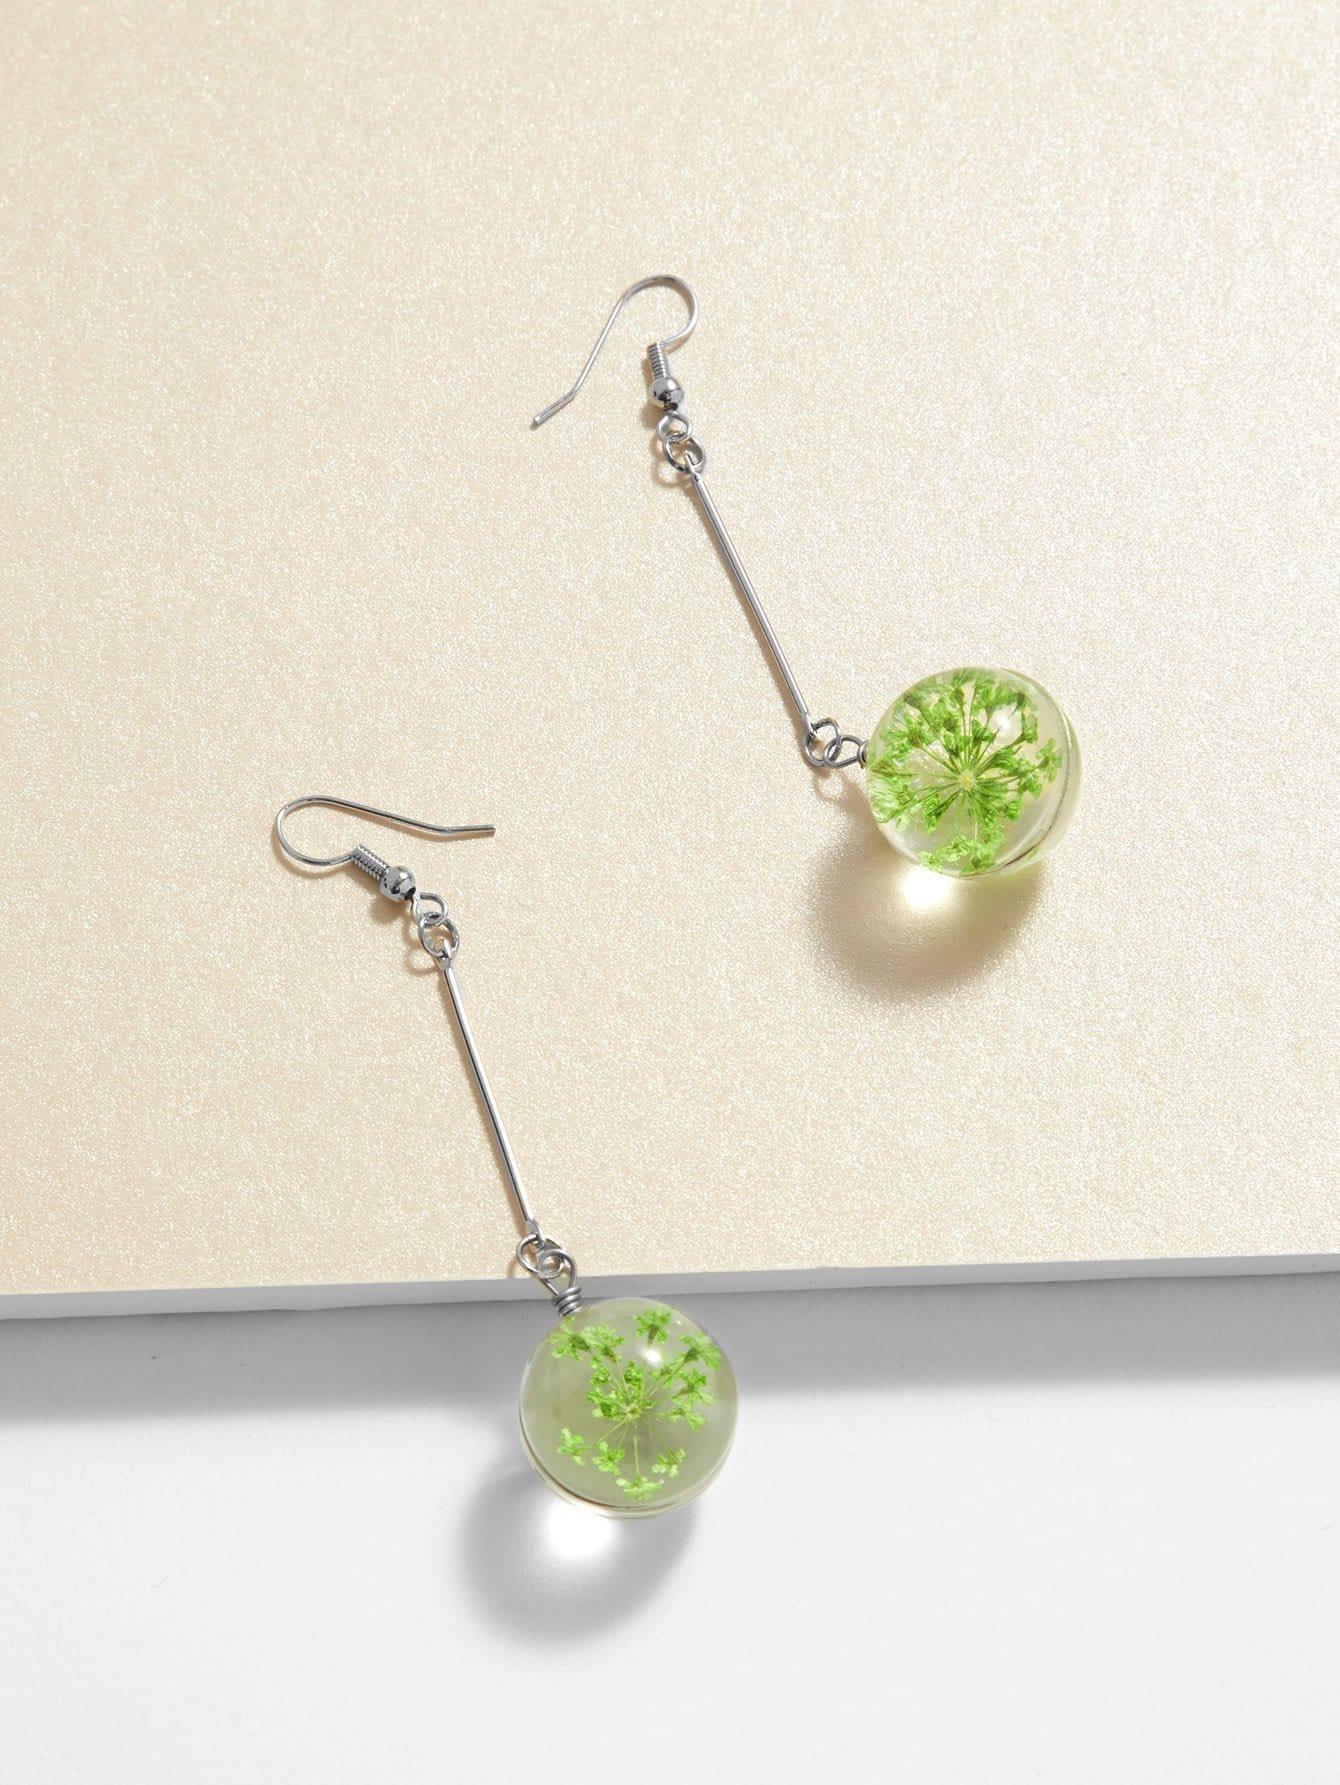 Glass Ball & Bar Design Drop Earrings silver plated bar dangle drop earrings